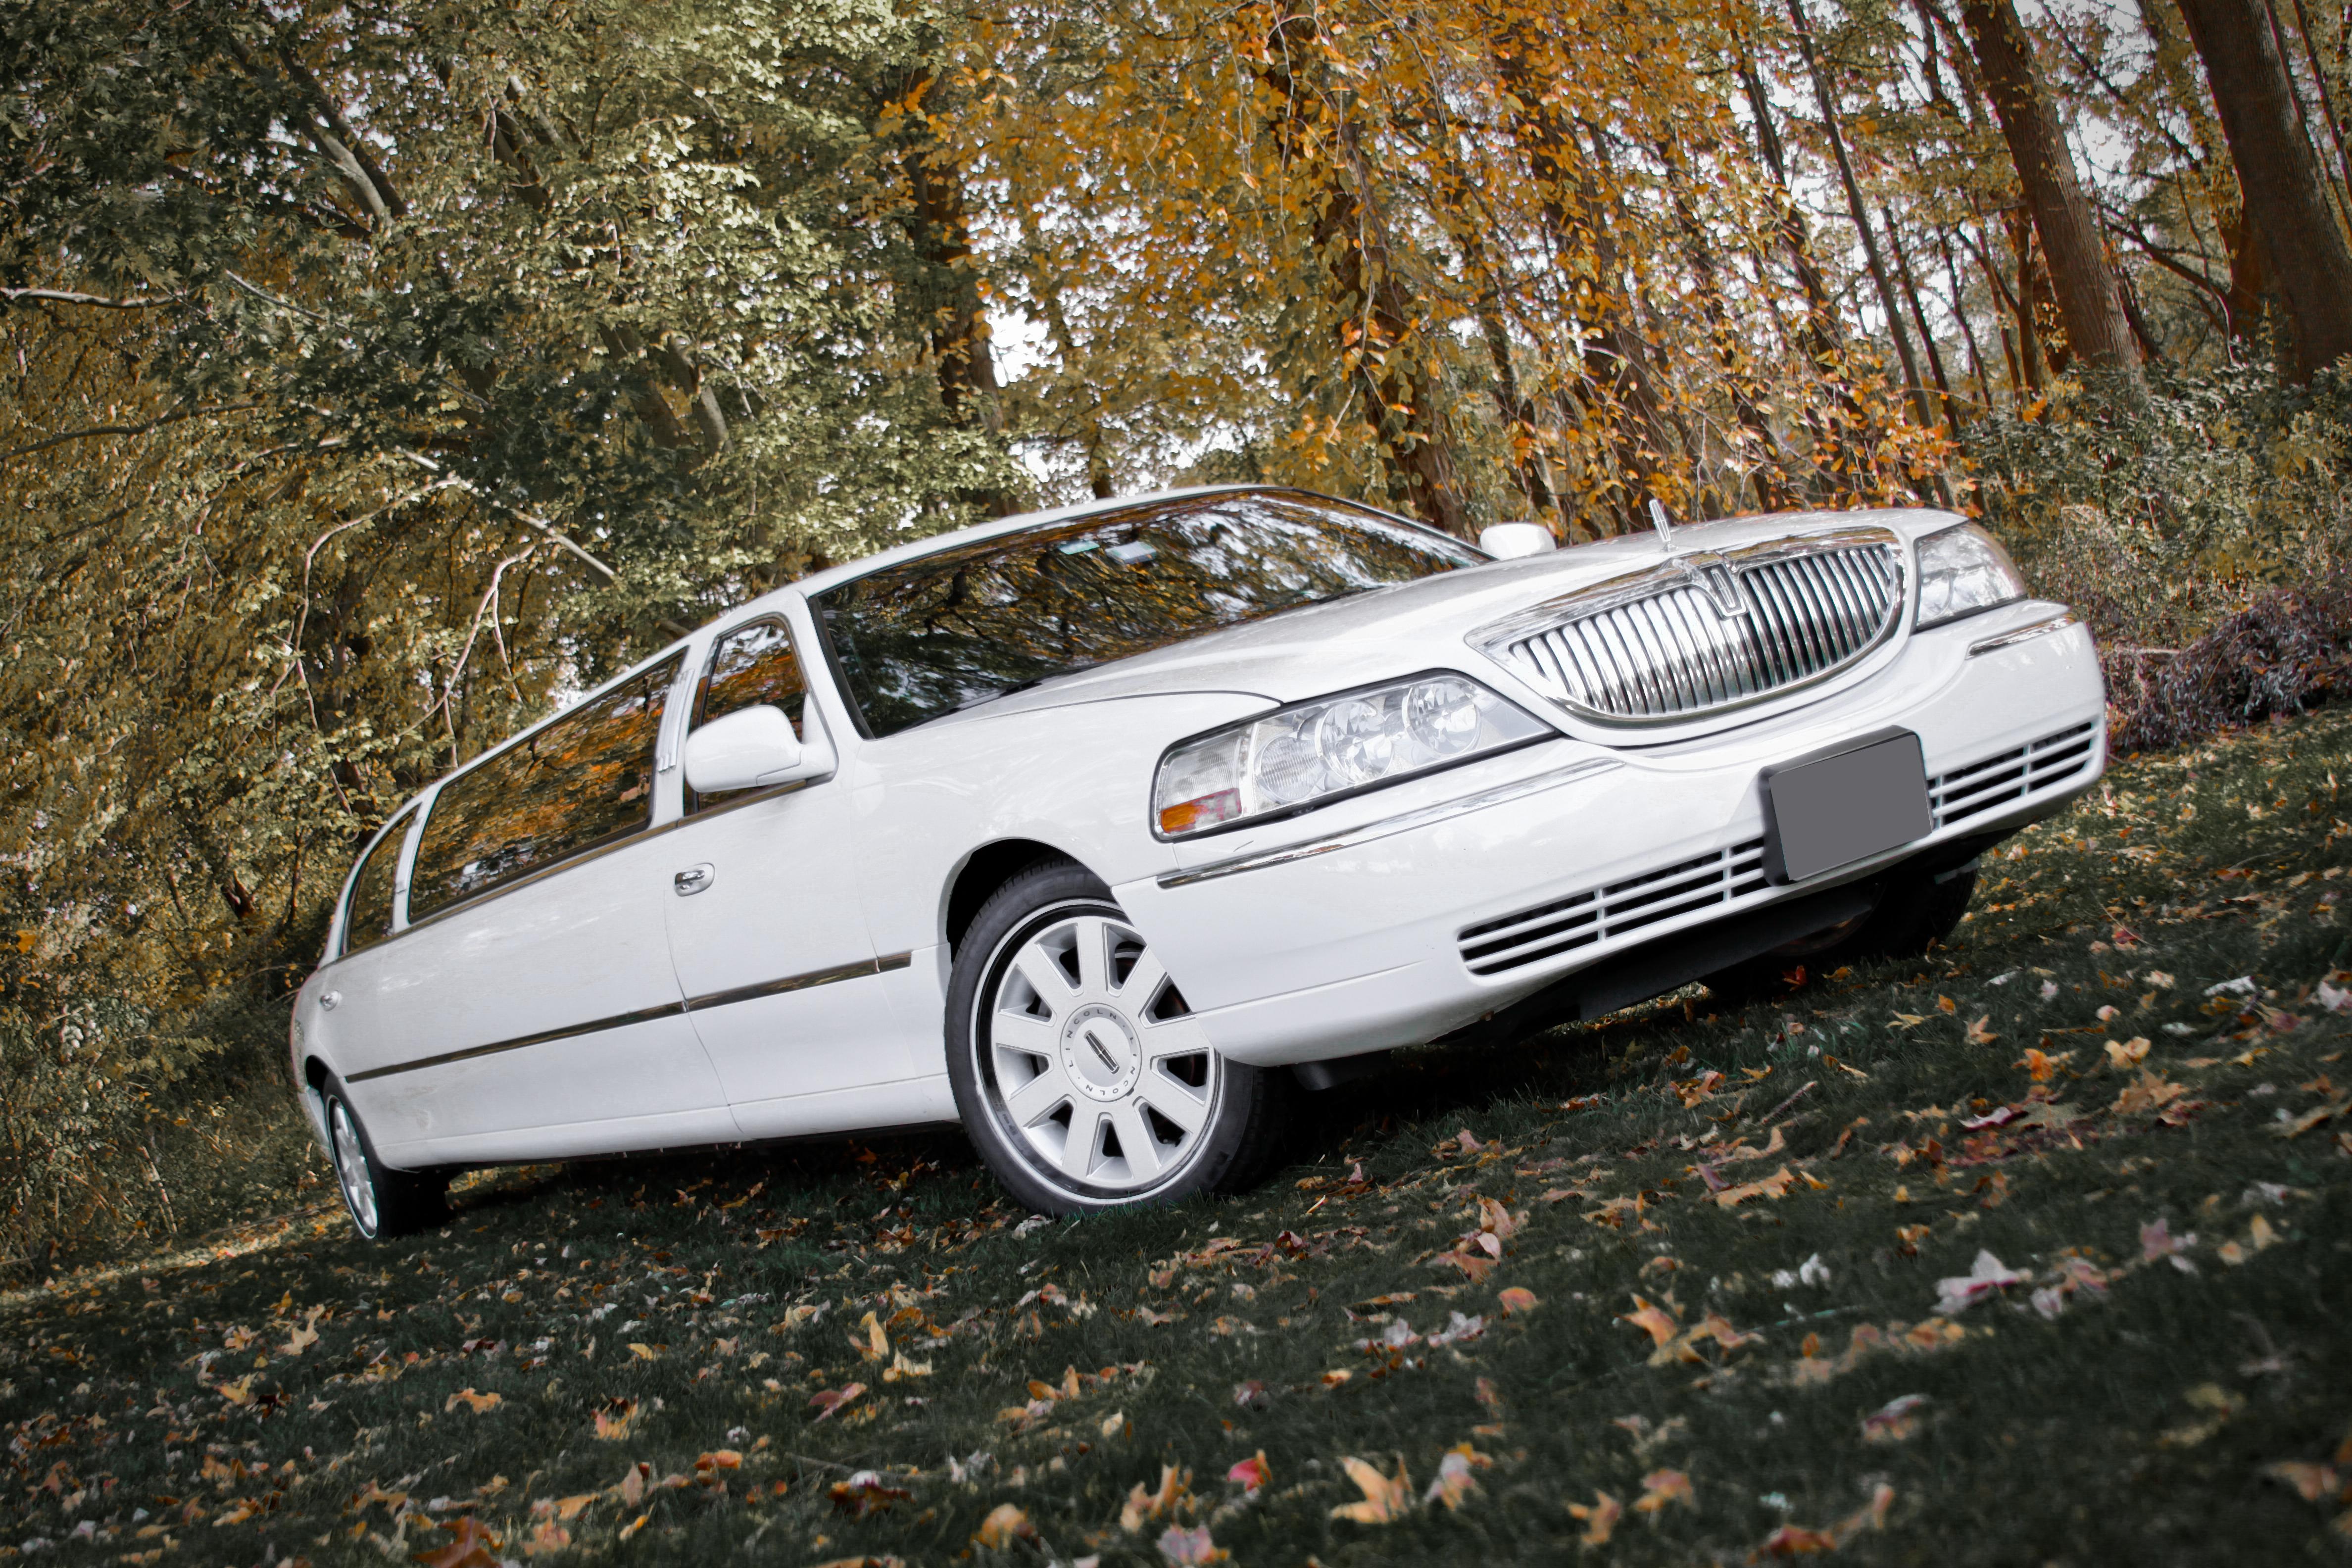 Limousine, inc, Fancylimoscom